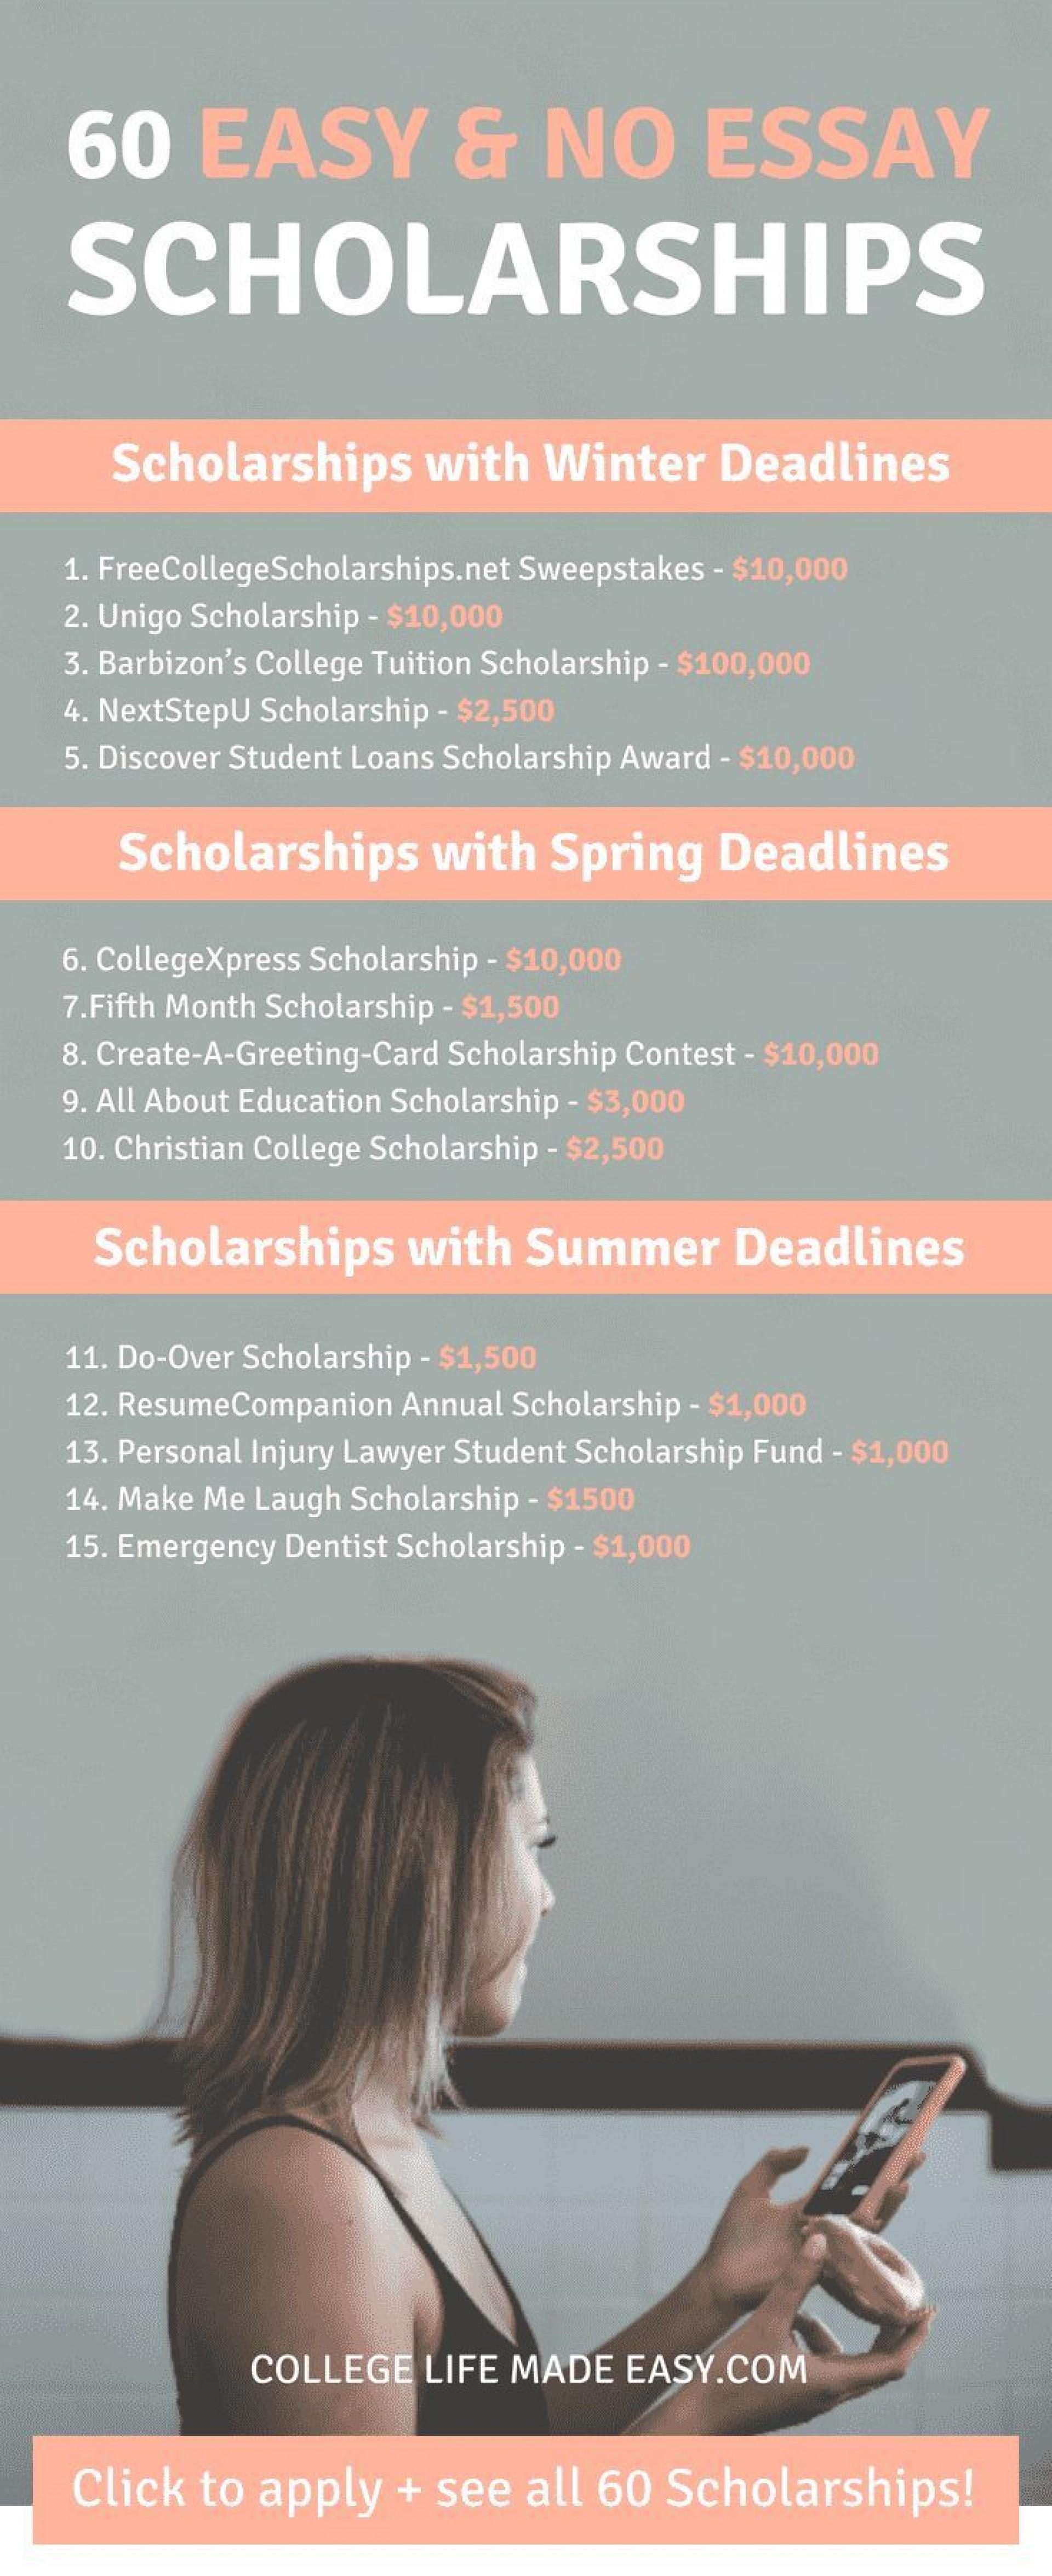 002 Essay Example Easy No Striking Scholarships 2015 2019 1920